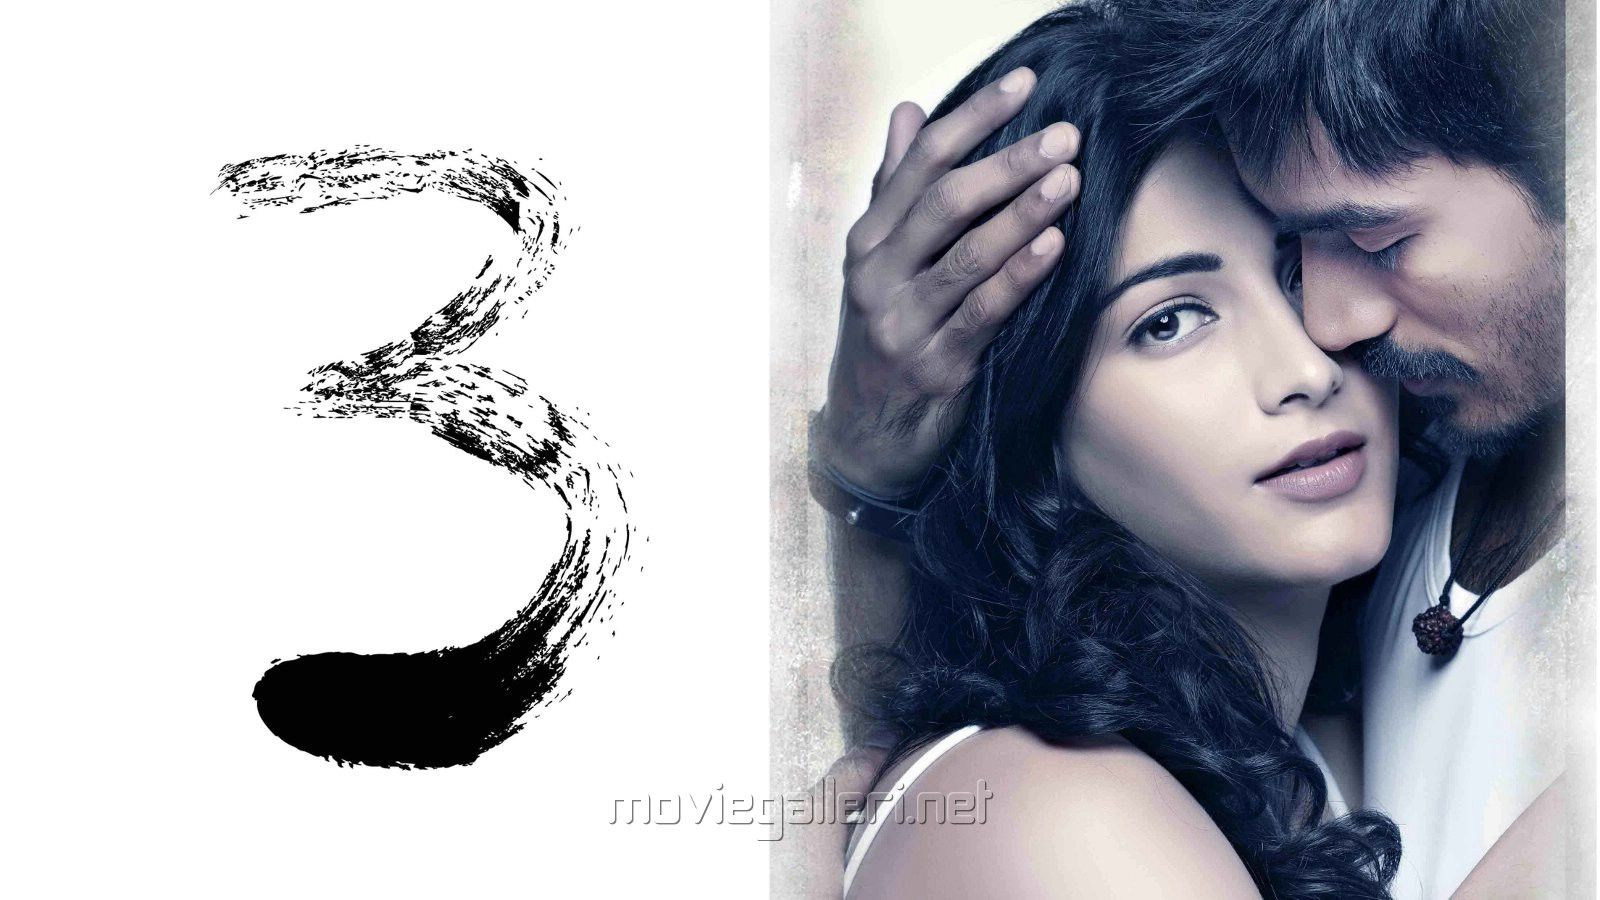 3 Wallpaper Dhanush All Facebook Wallpapers 1080p 3 Movie Movie Wallpapers Anirudh Ravichander